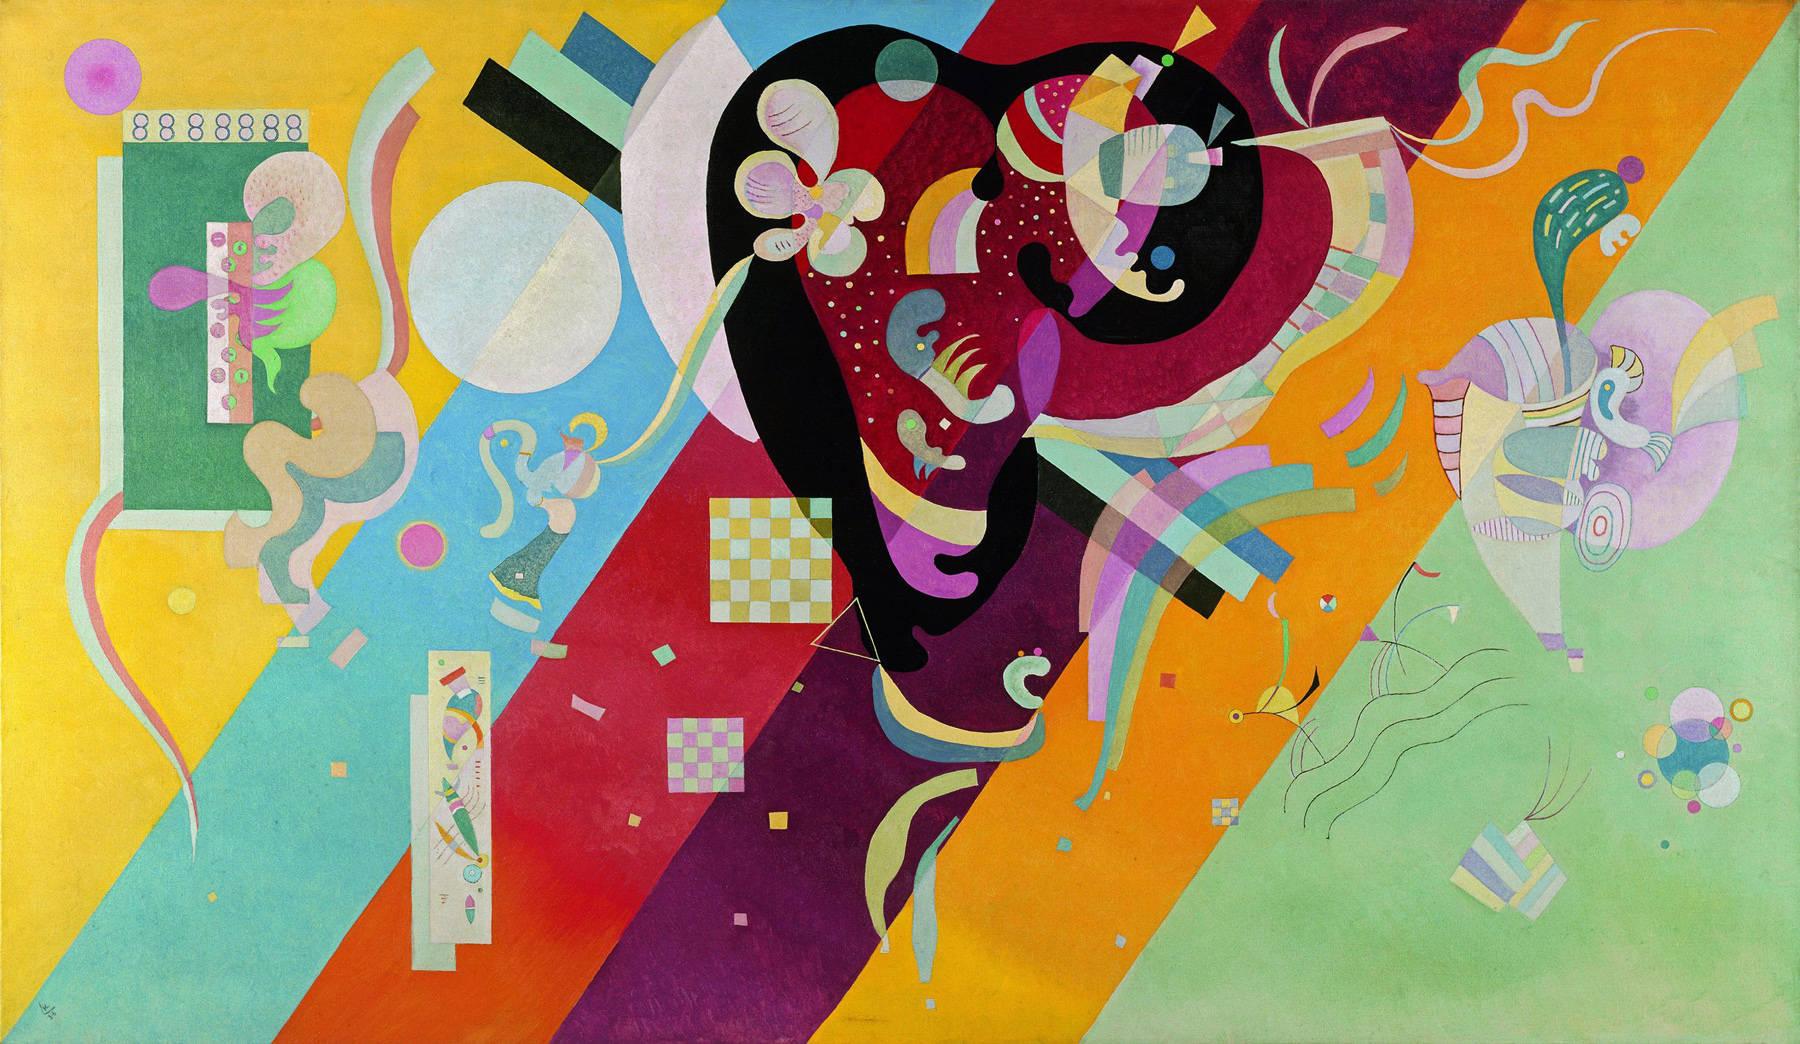 wassily-kandinsky-composition-IX